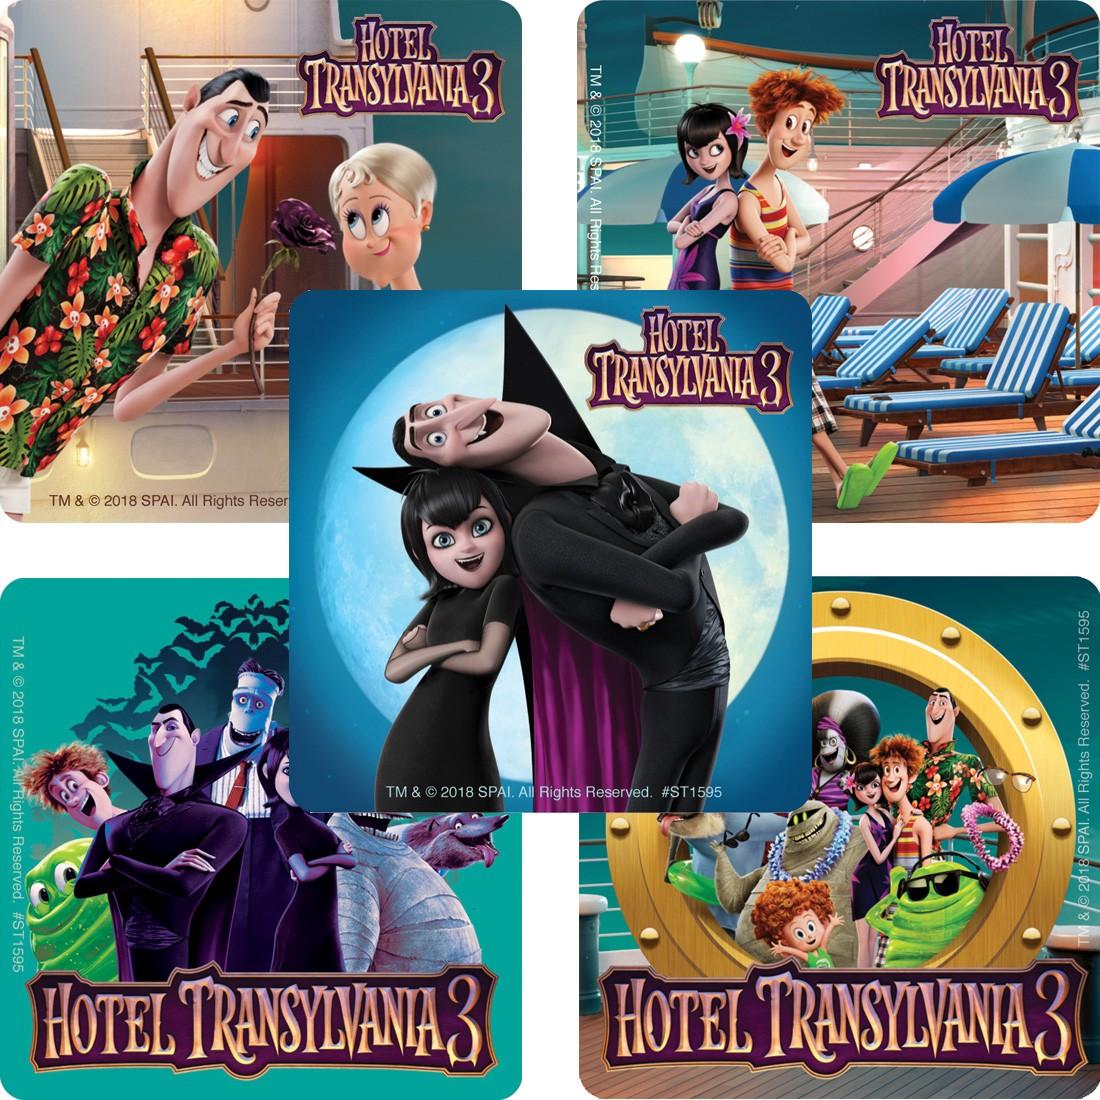 Hotel Transylvania 3 Stickers  [image]